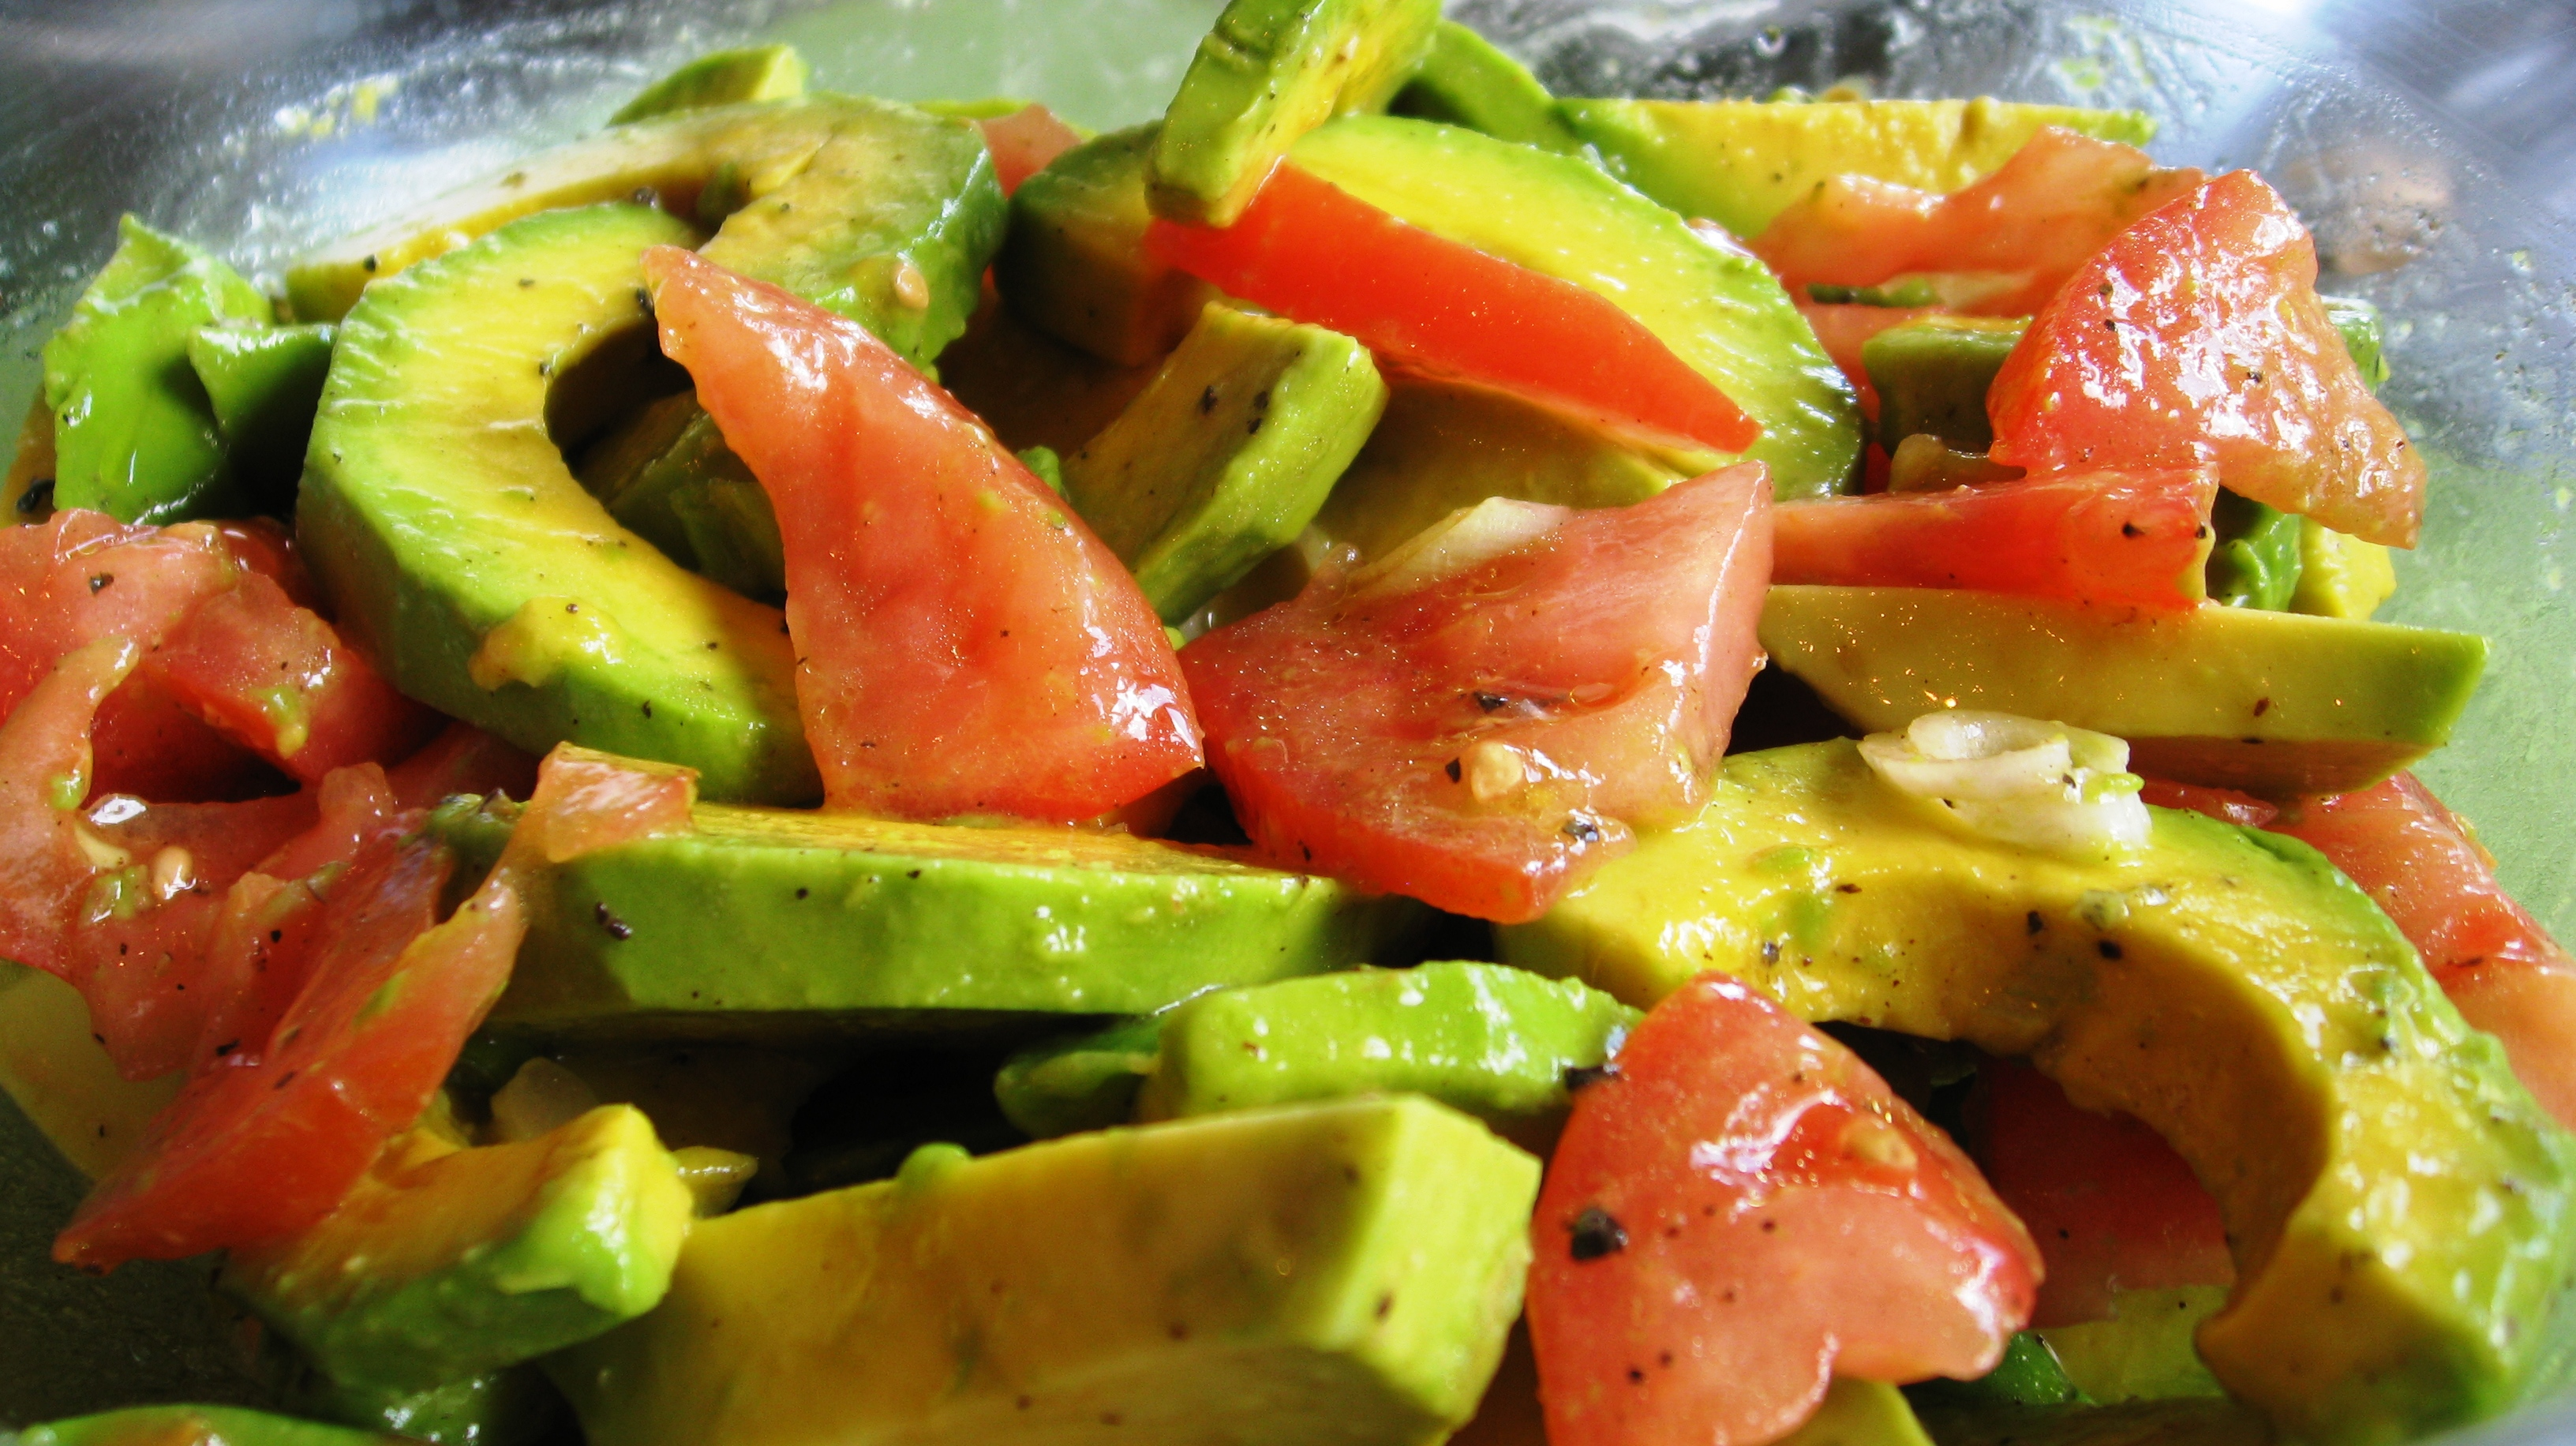 ensalada de agucate y tomate avocado and tomato salad. Black Bedroom Furniture Sets. Home Design Ideas